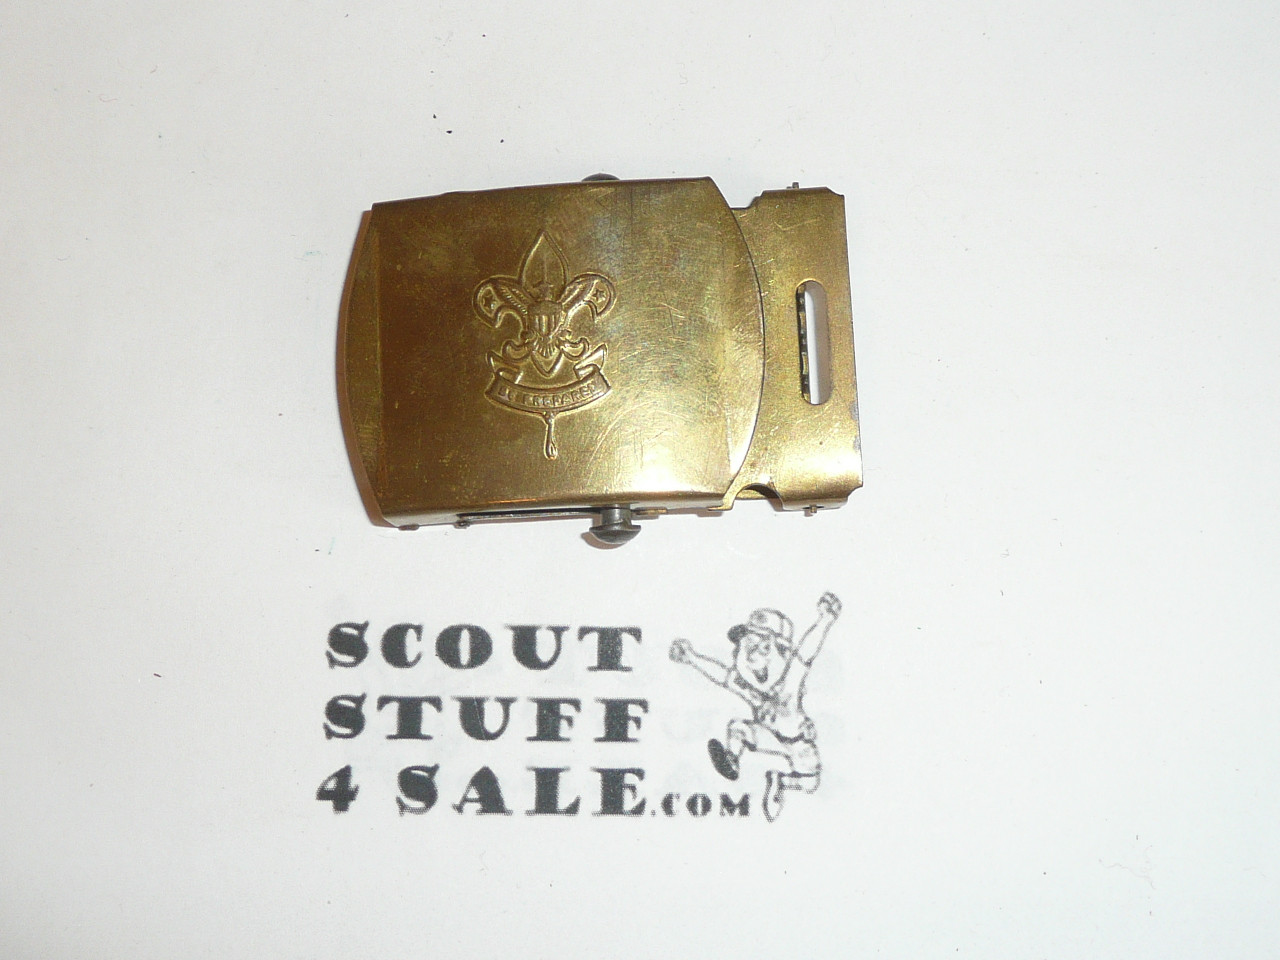 1960's Boy Scout Brass Friction Belt Buckle, used